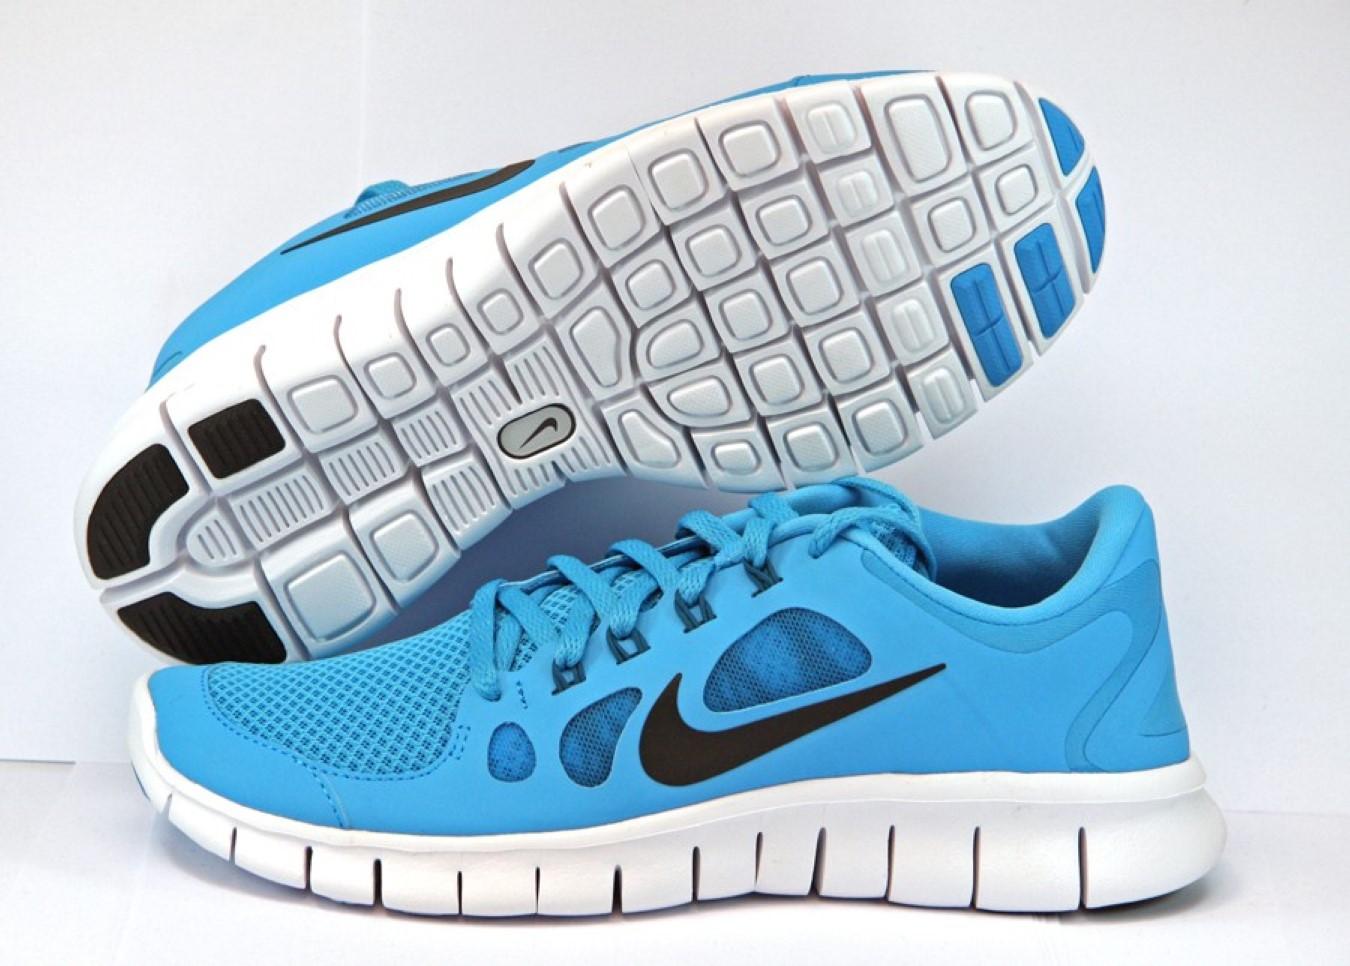 nike free 5 0 running 580558 blau 402 schuhe sneaker 36 37. Black Bedroom Furniture Sets. Home Design Ideas